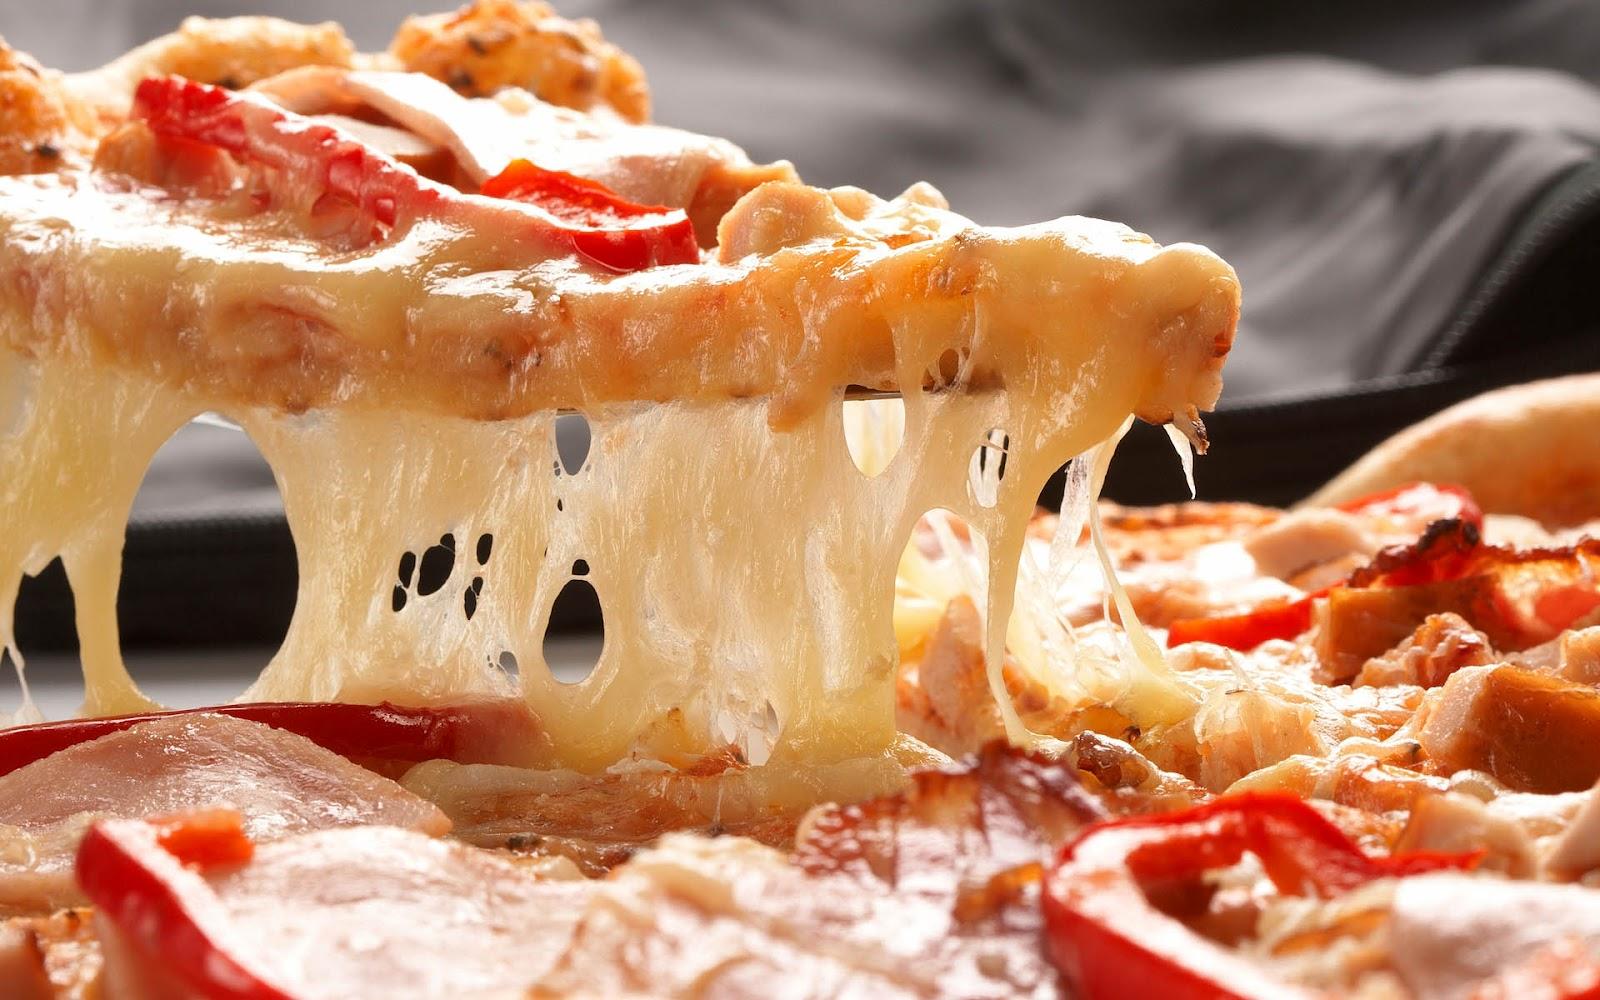 http://4.bp.blogspot.com/-AbT4PVxe5NU/UEsE6QzQEyI/AAAAAAAAG1Q/y2Xc4tZ0LdU/s1600/hd-pizza-achtergrond-lekker-stuk-pizza-met-gesmolten-kaas-hd-eten-wallpaper-foto.jpg